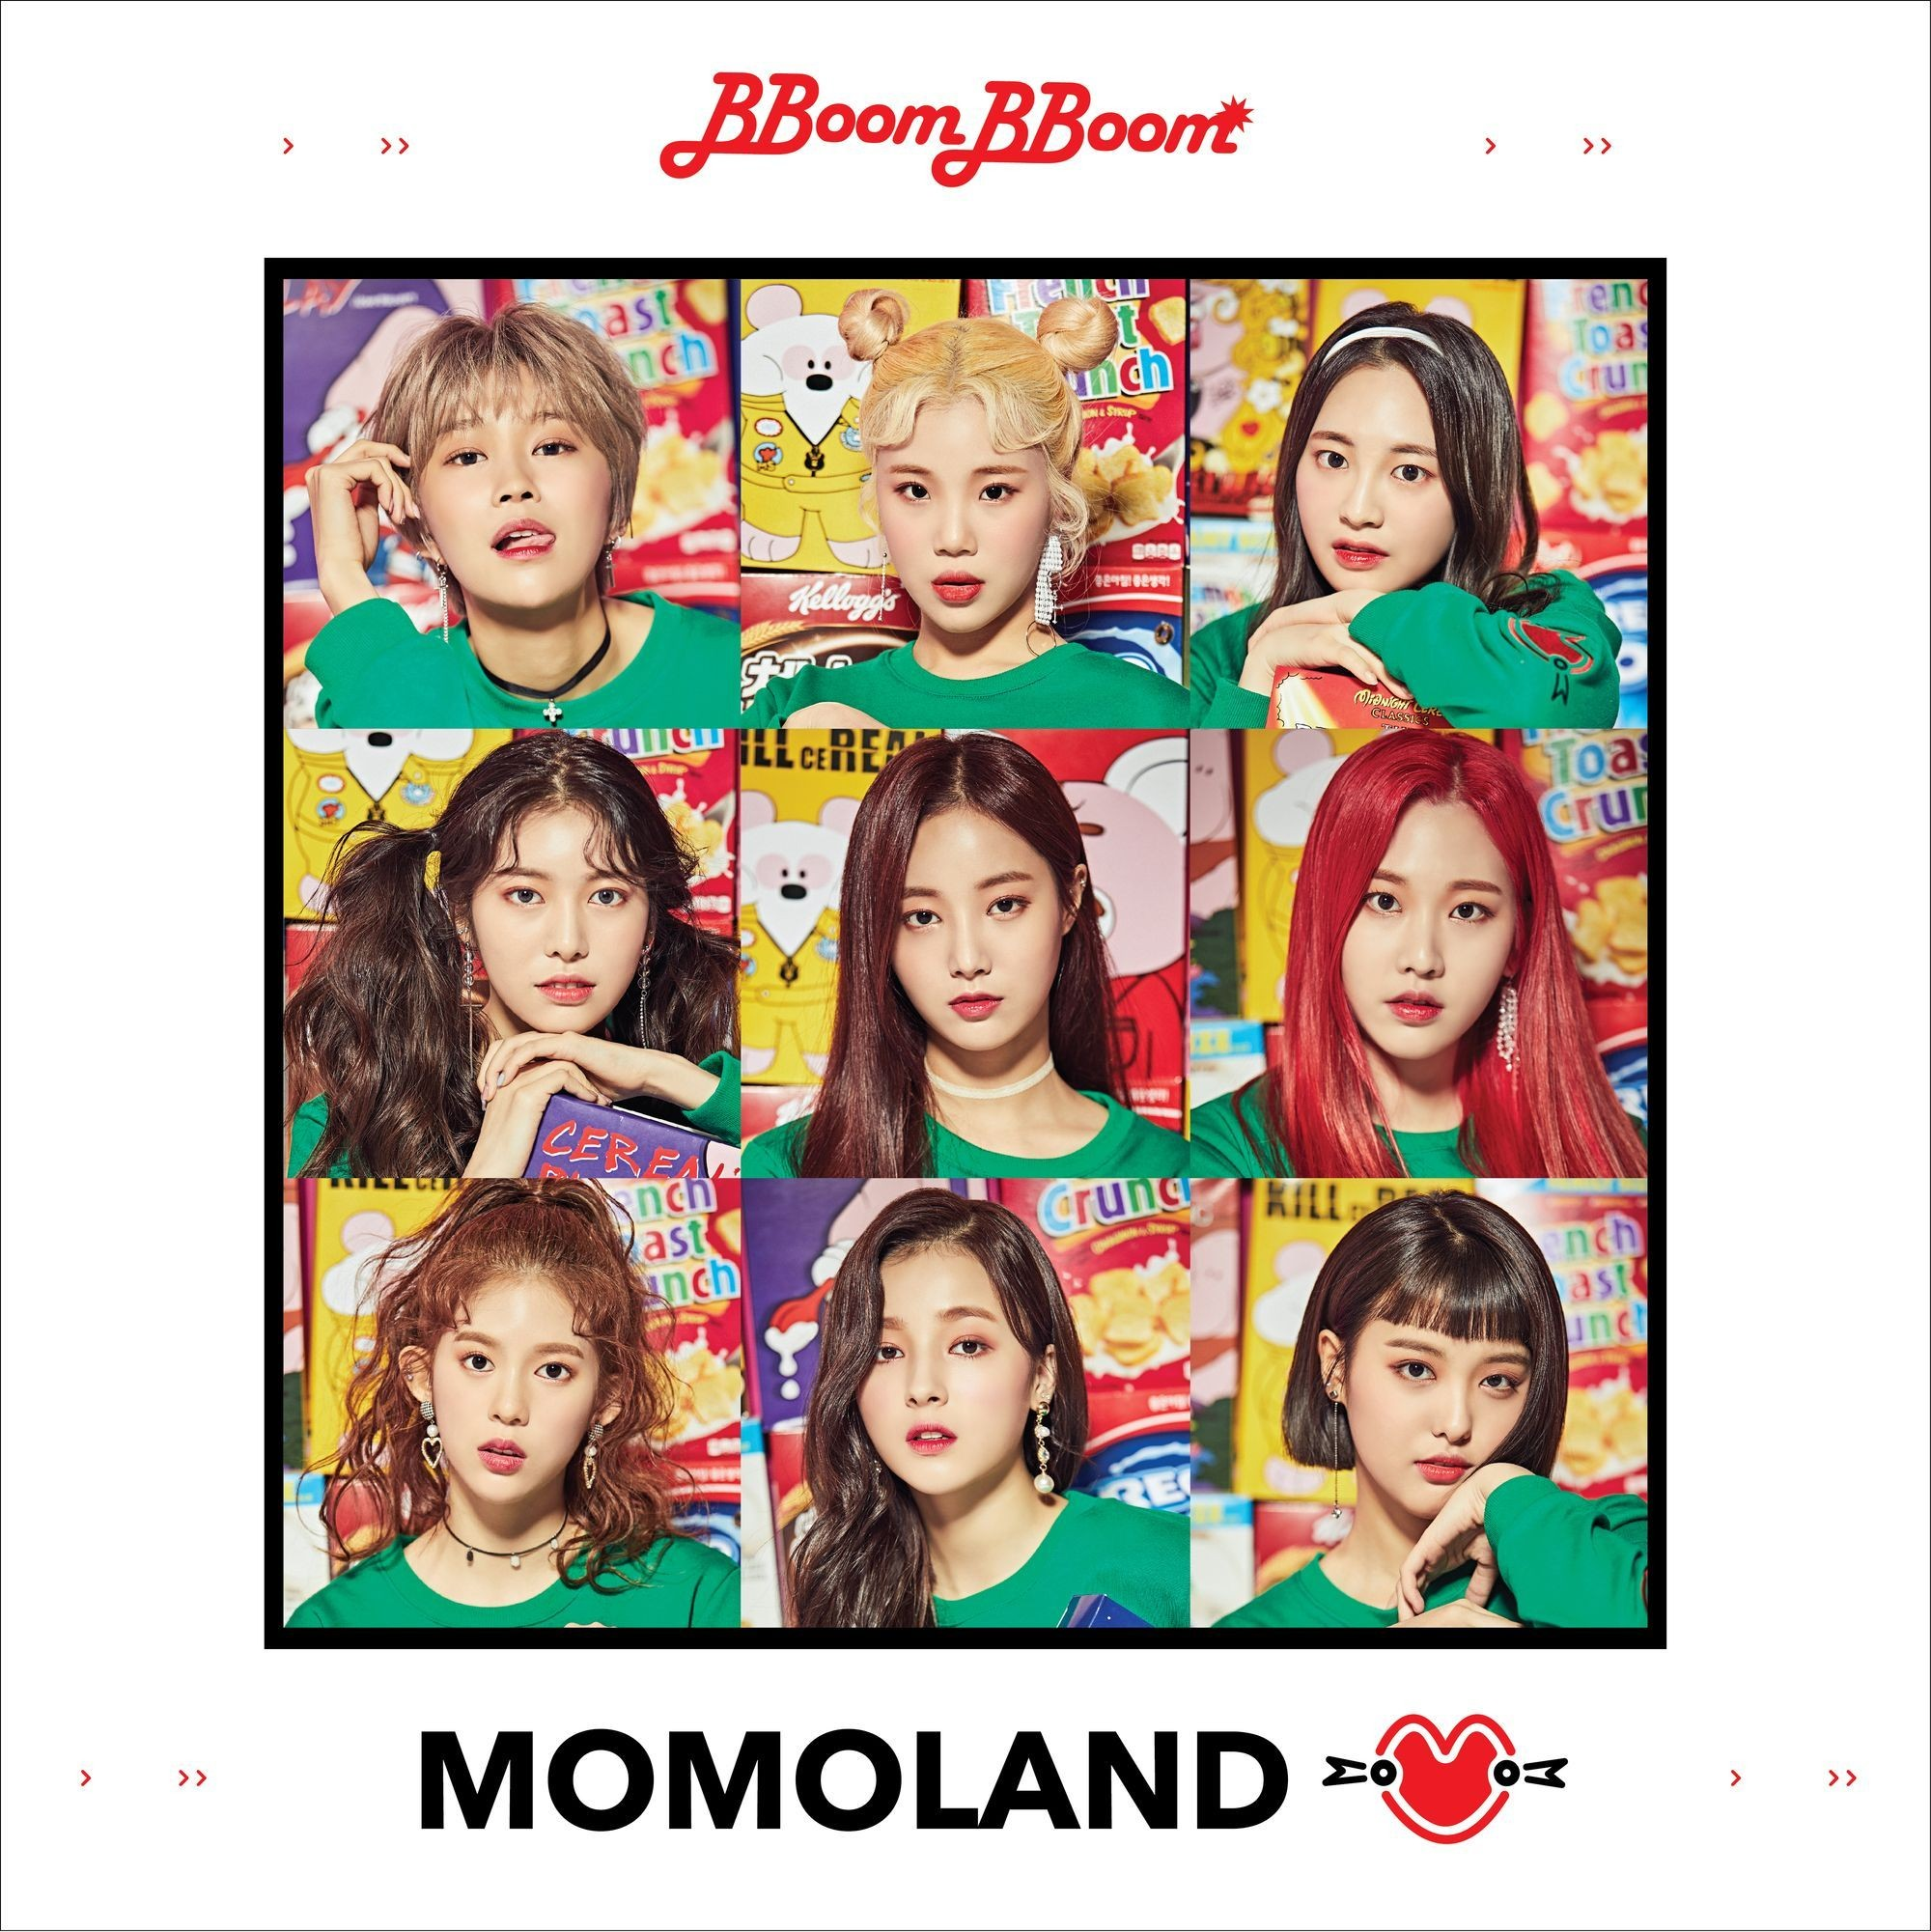 MOMOLAND (모모랜드) – GREAT! [FLAC + MP3 320 / WEB] [2018.01.03]